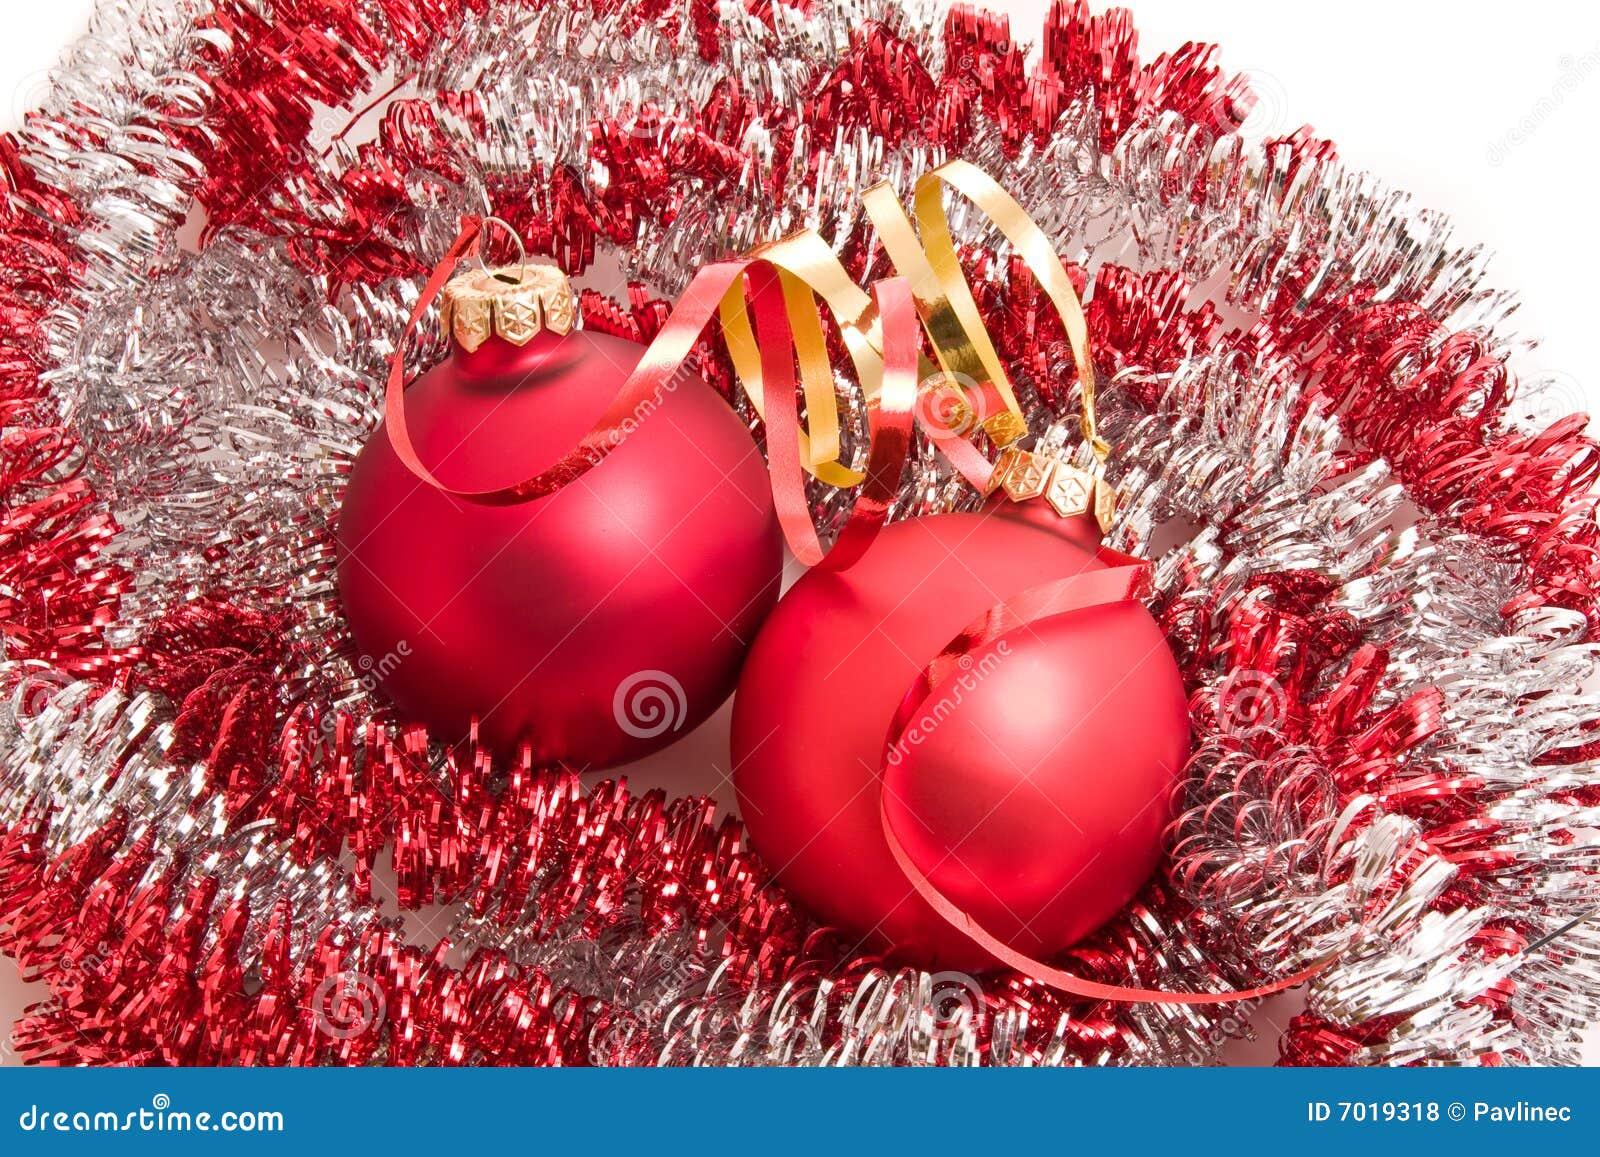 Christmas balls and tinsel royalty free stock photos